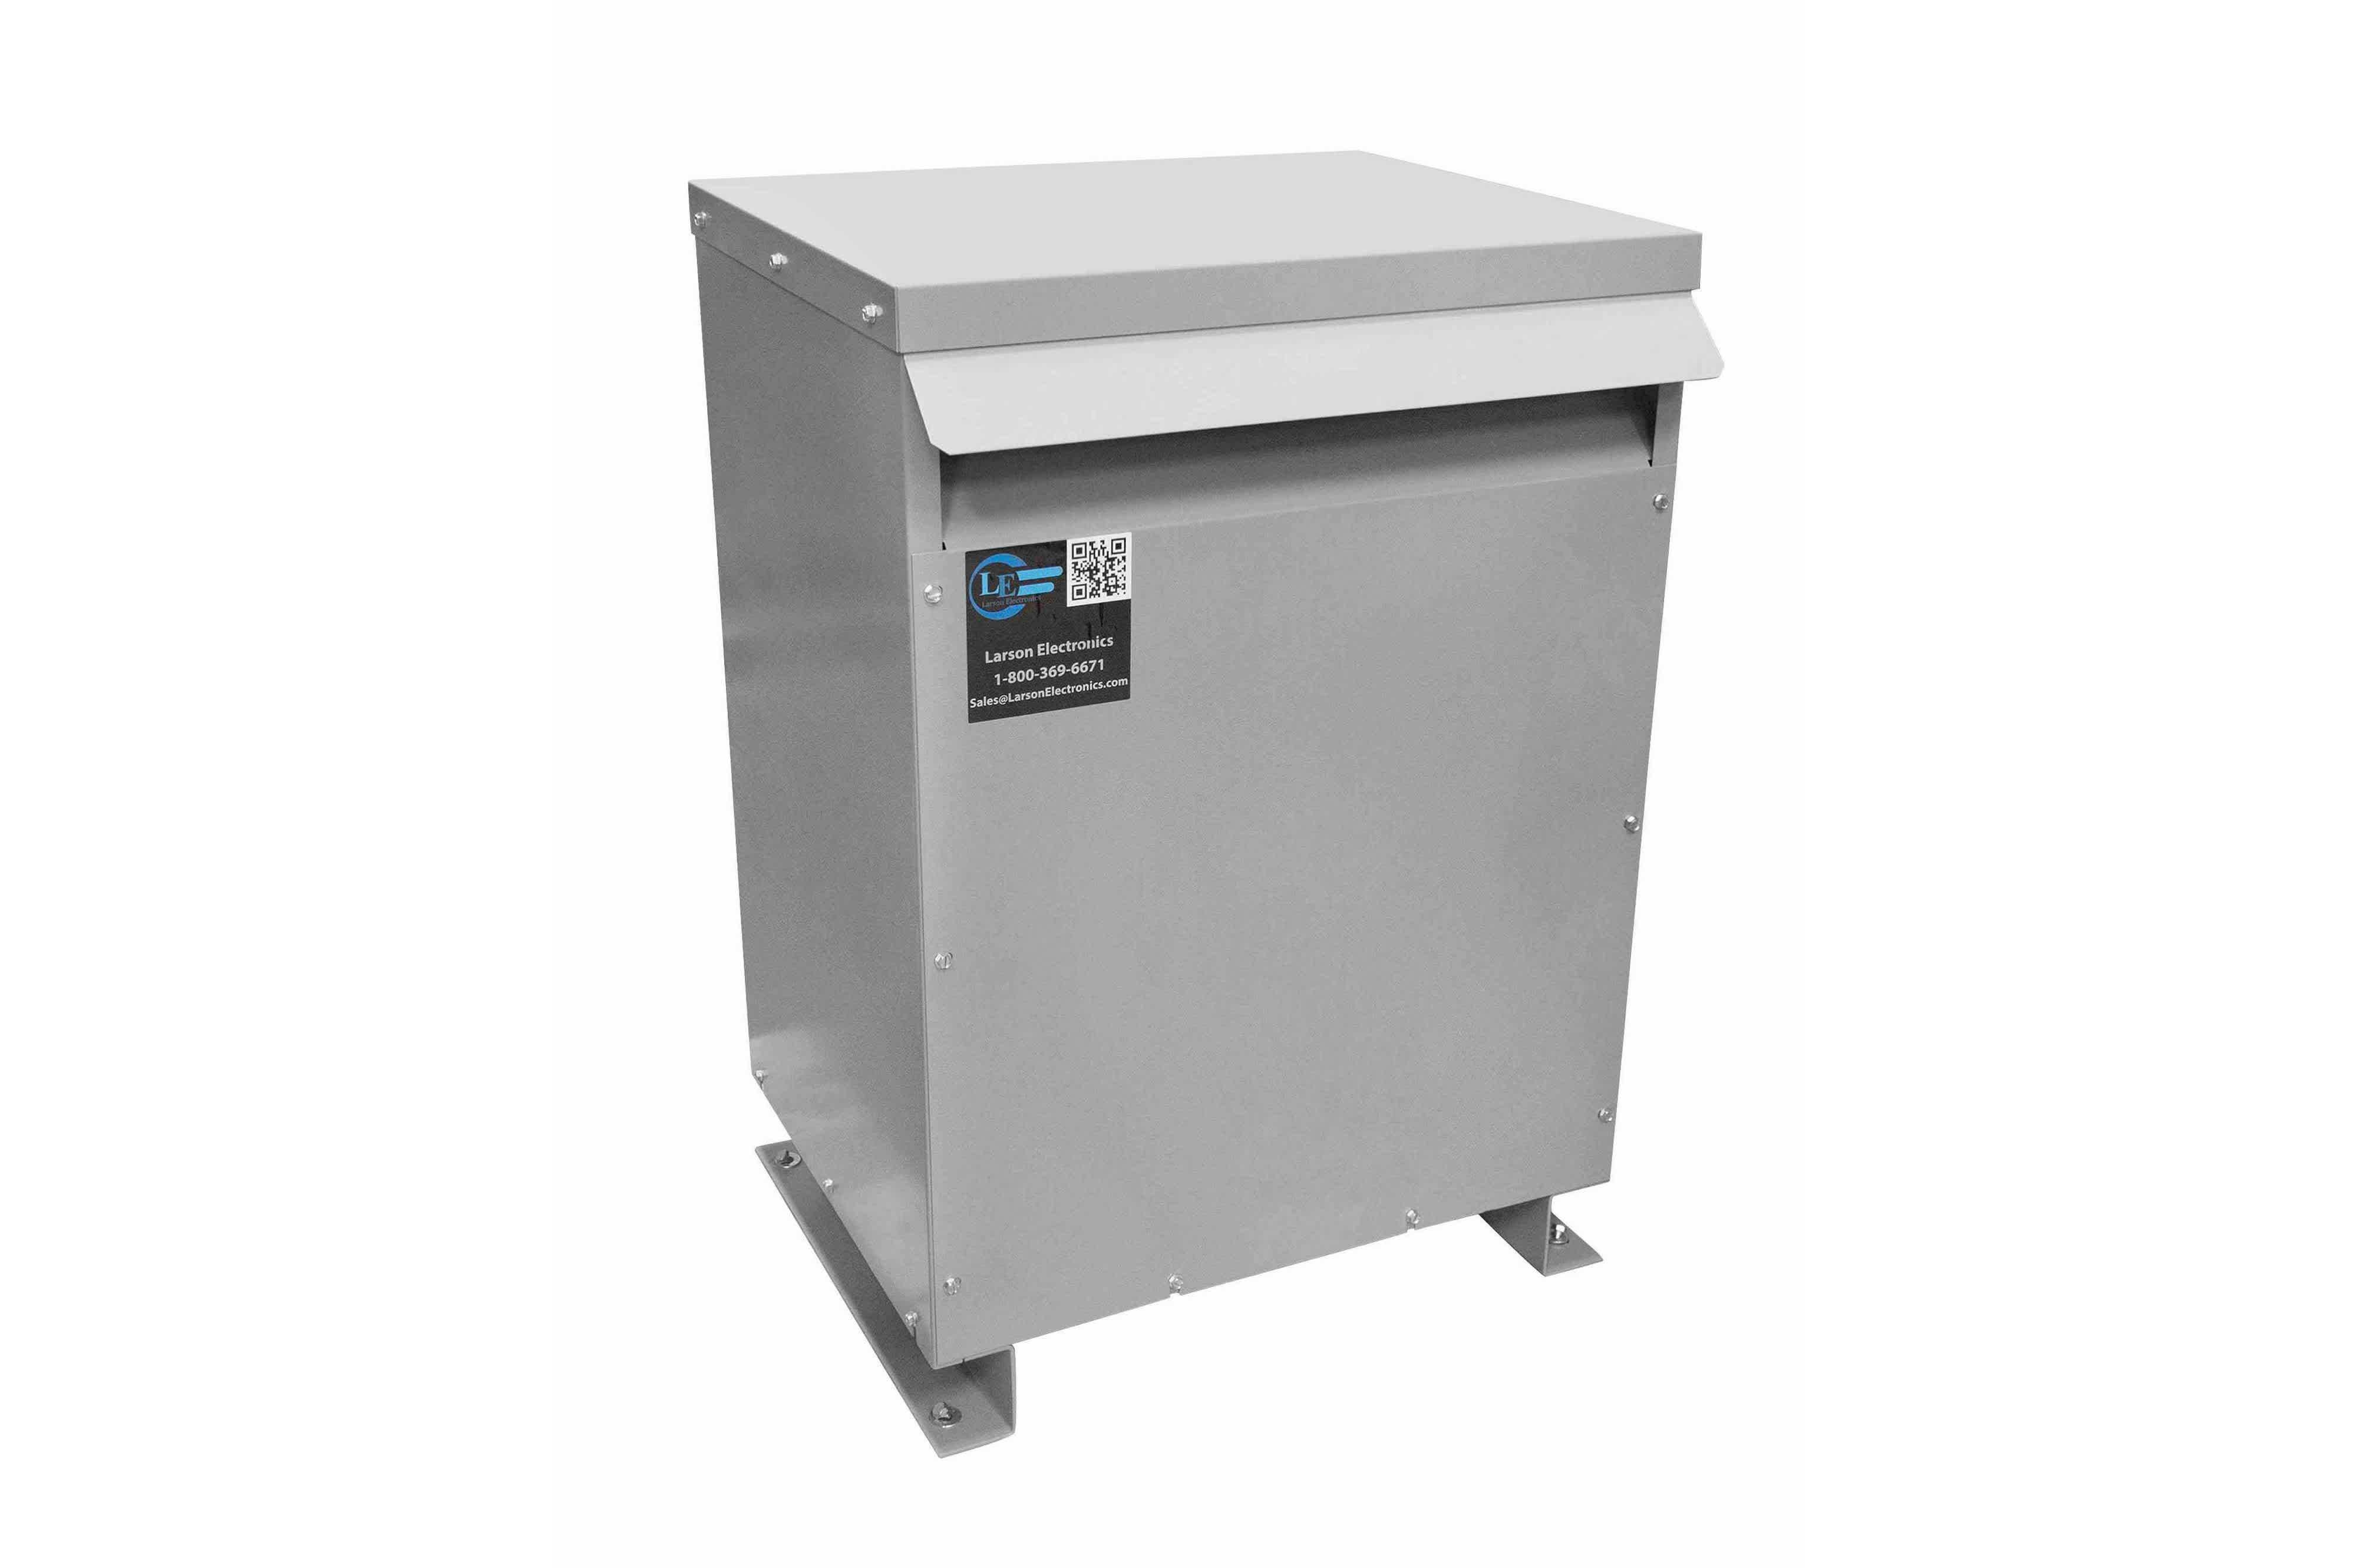 18 kVA 3PH Isolation Transformer, 460V Wye Primary, 380Y/220 Wye-N Secondary, N3R, Ventilated, 60 Hz